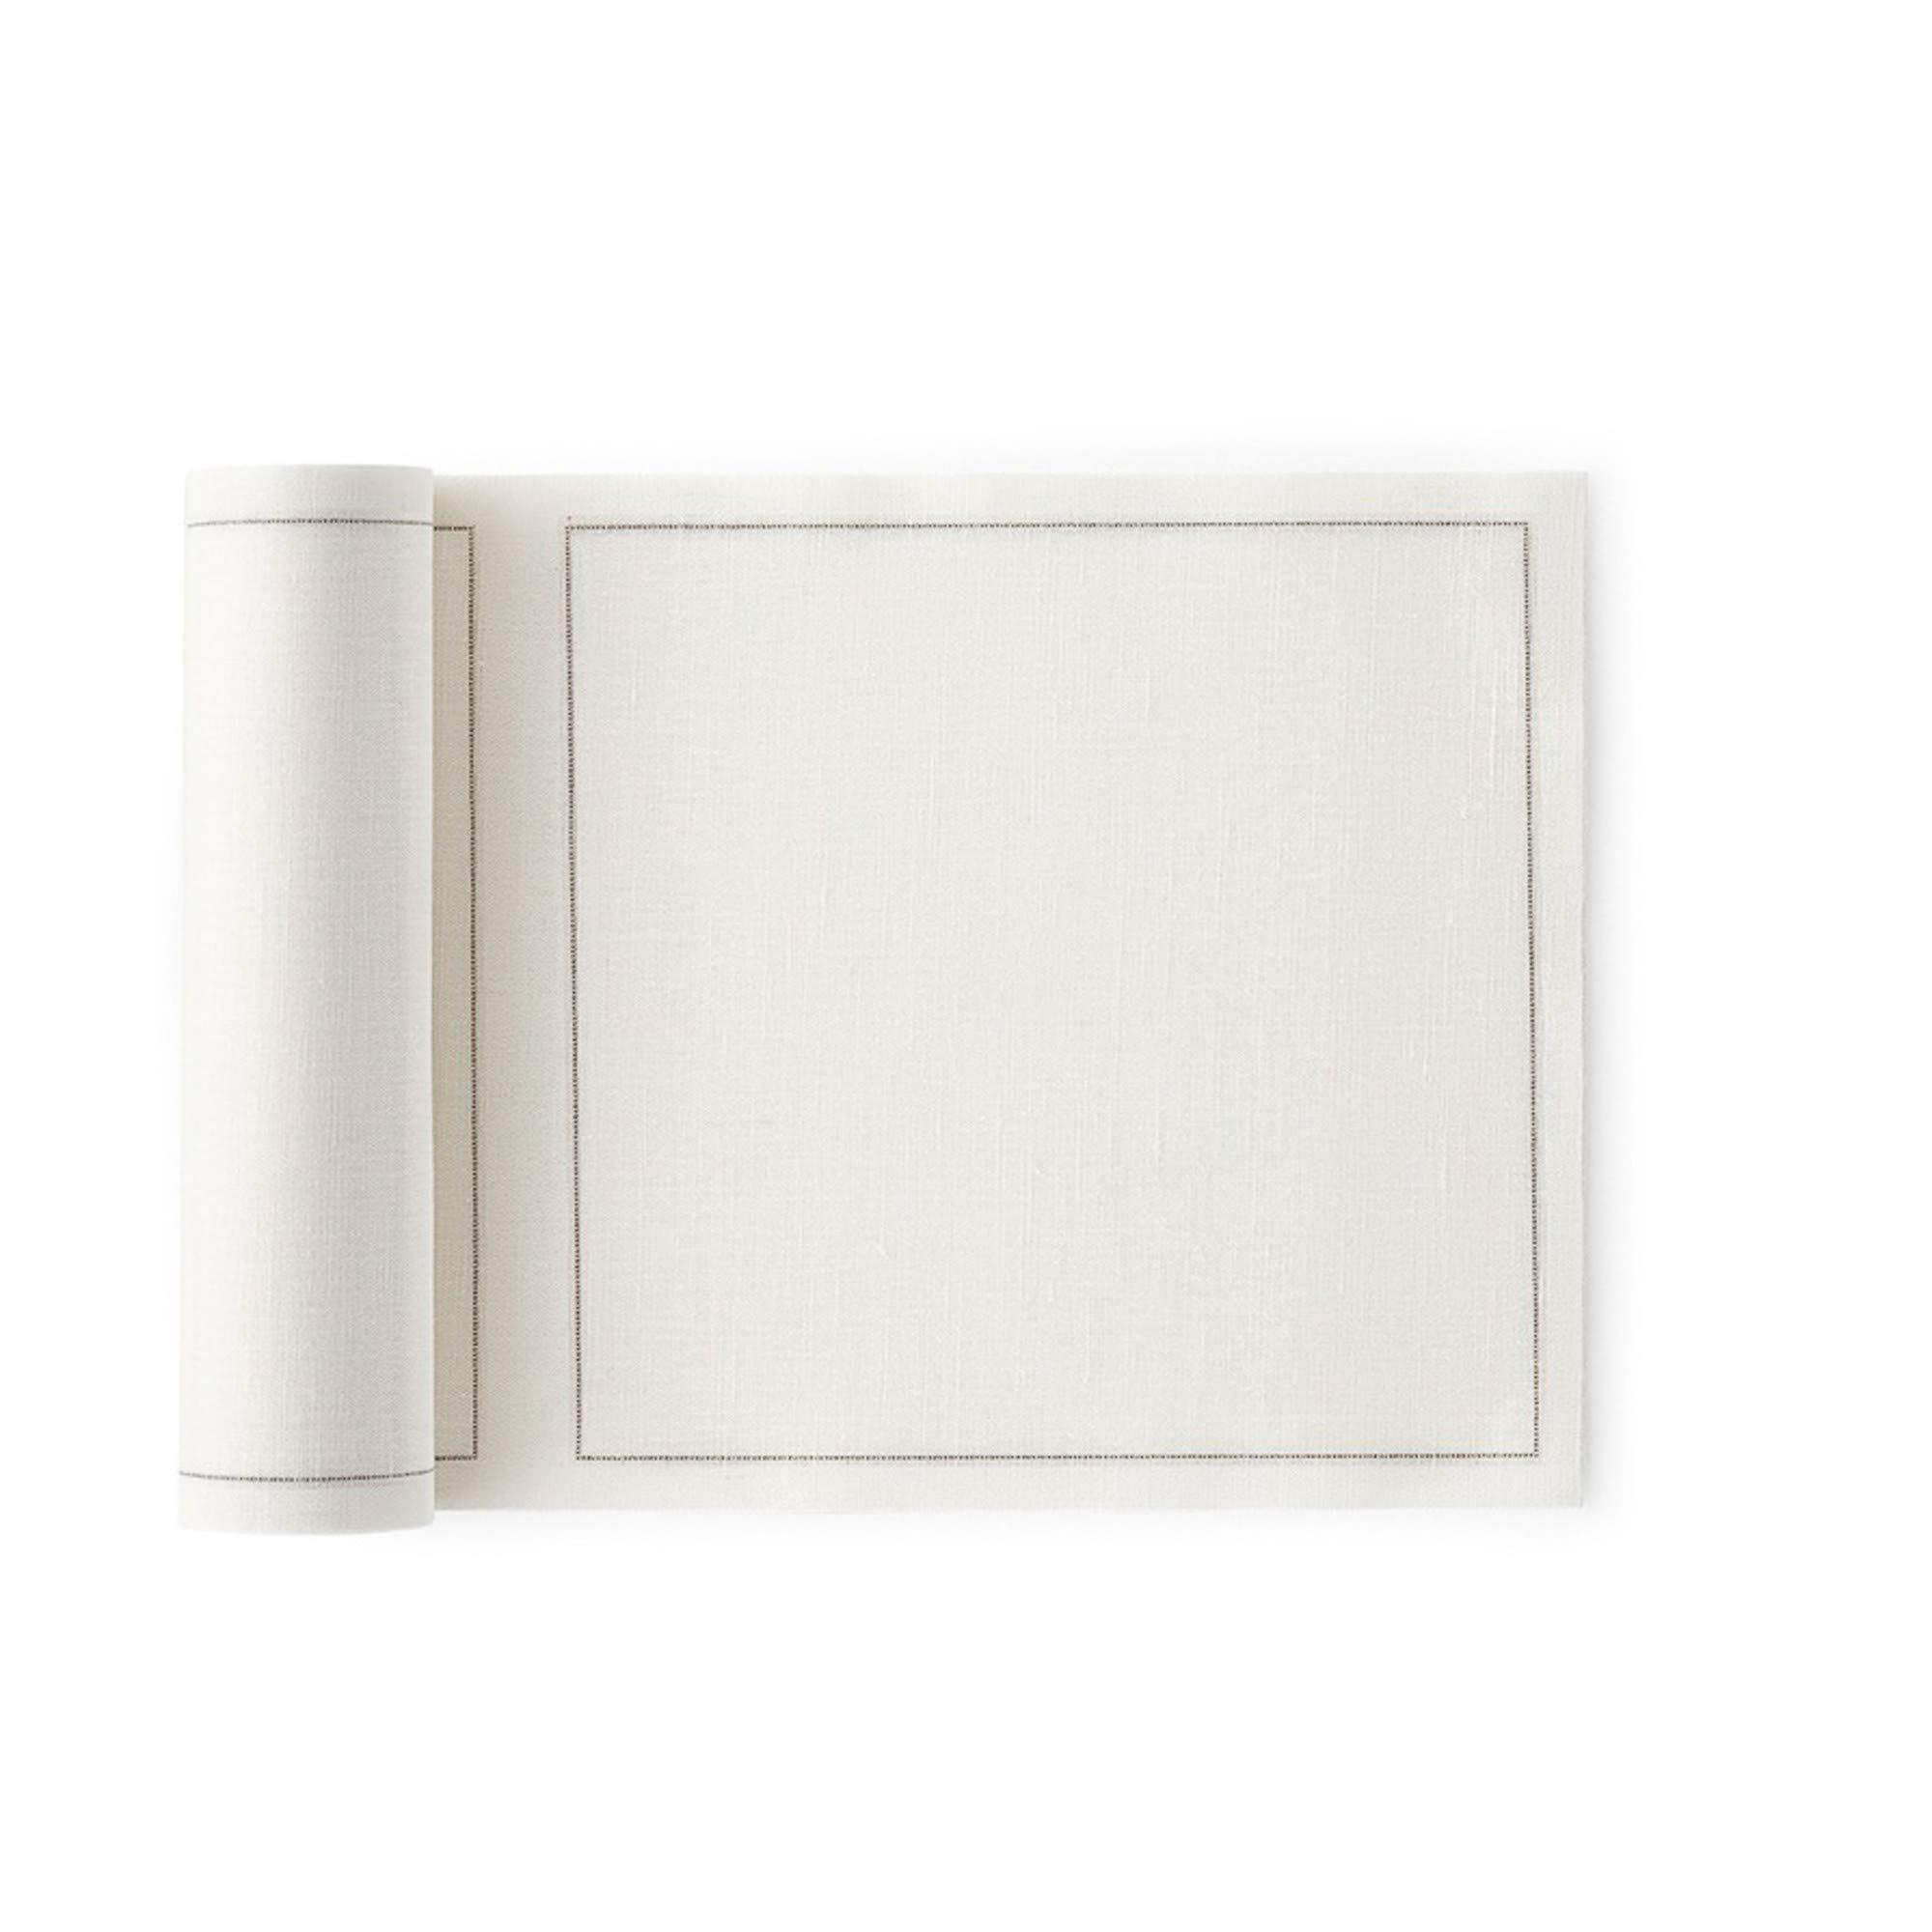 MY DRAP Basics Linen Luncheon Napkin, Cream, 7.9 x 7.9 inch, 40 Napkins by MY DRAP